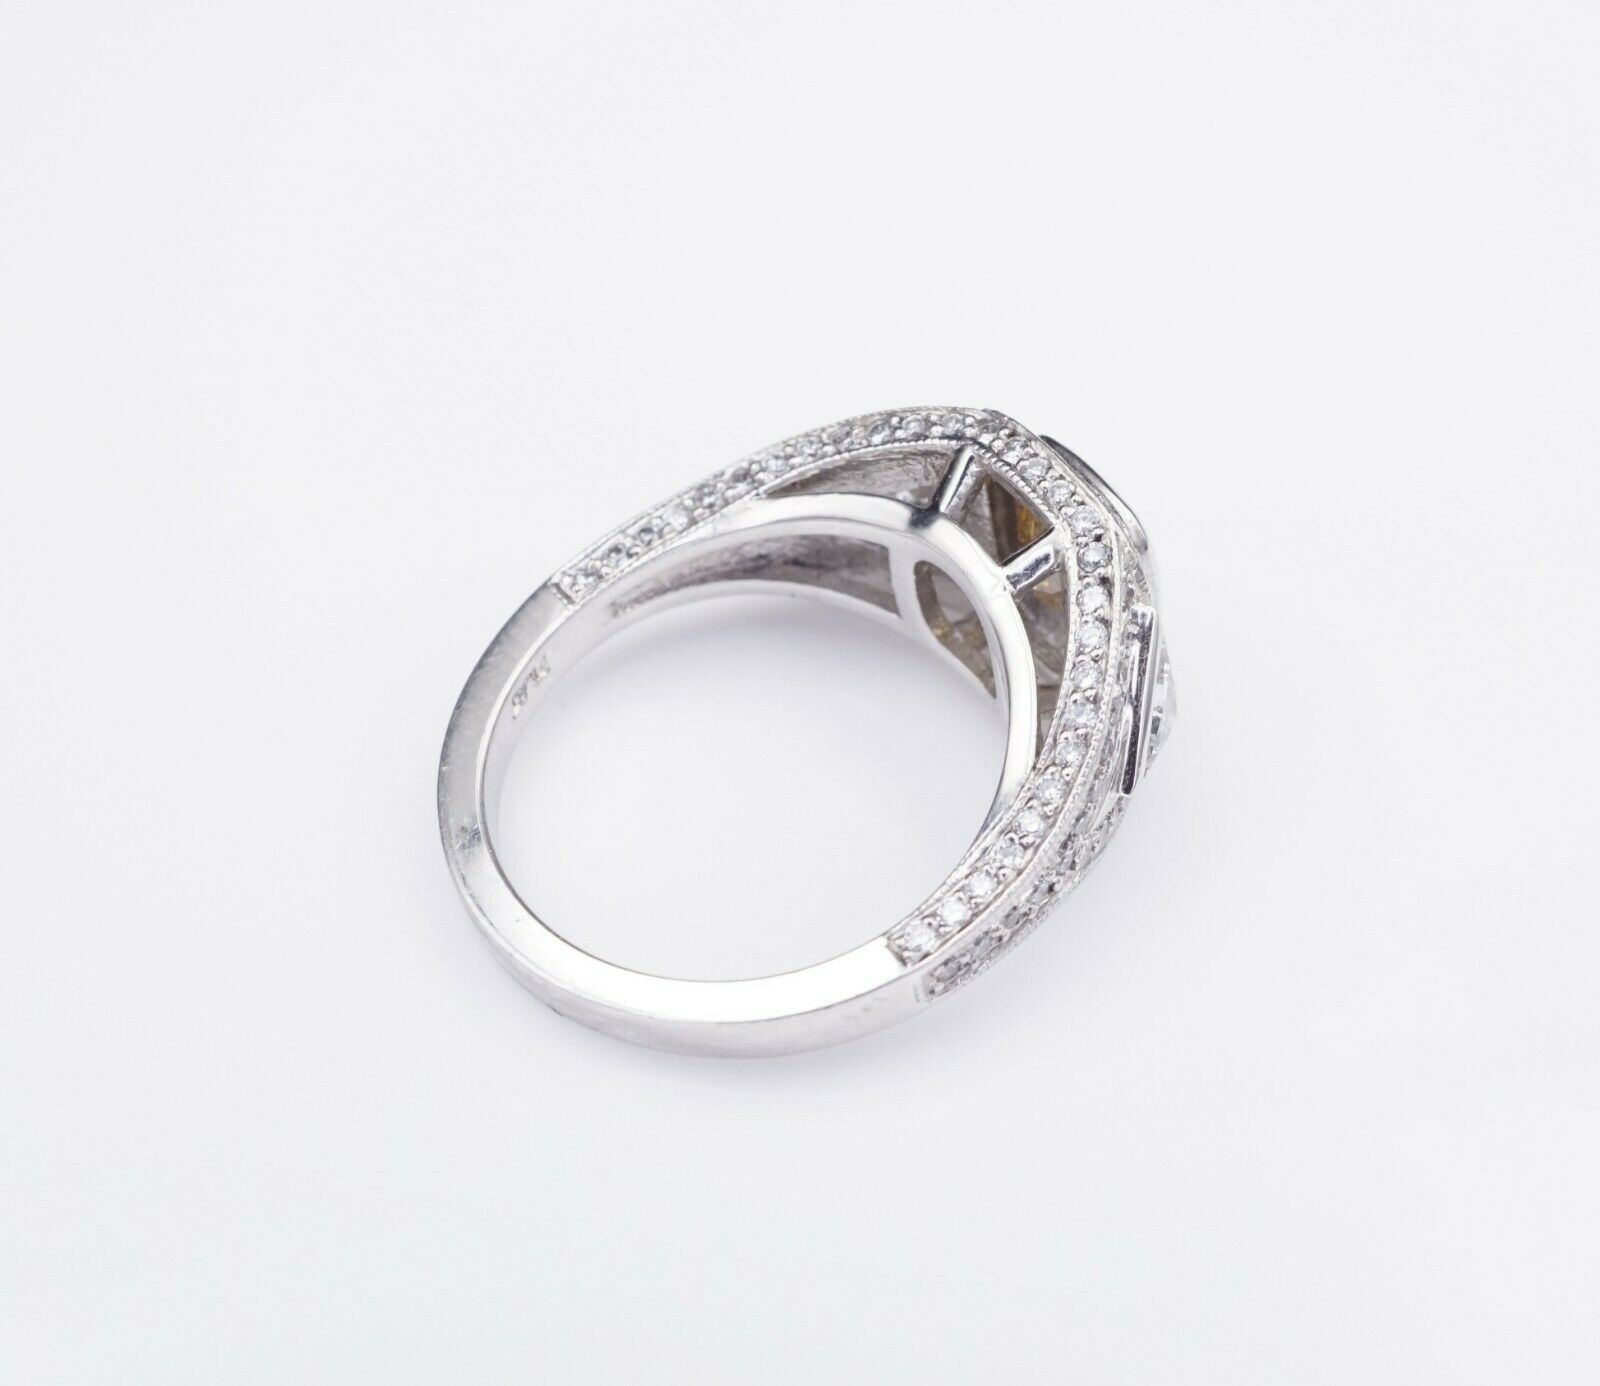 Platinum 3ct Orange-Yellow Diamond Halo Engagement Ring Size 6.75 GIA CO450 4